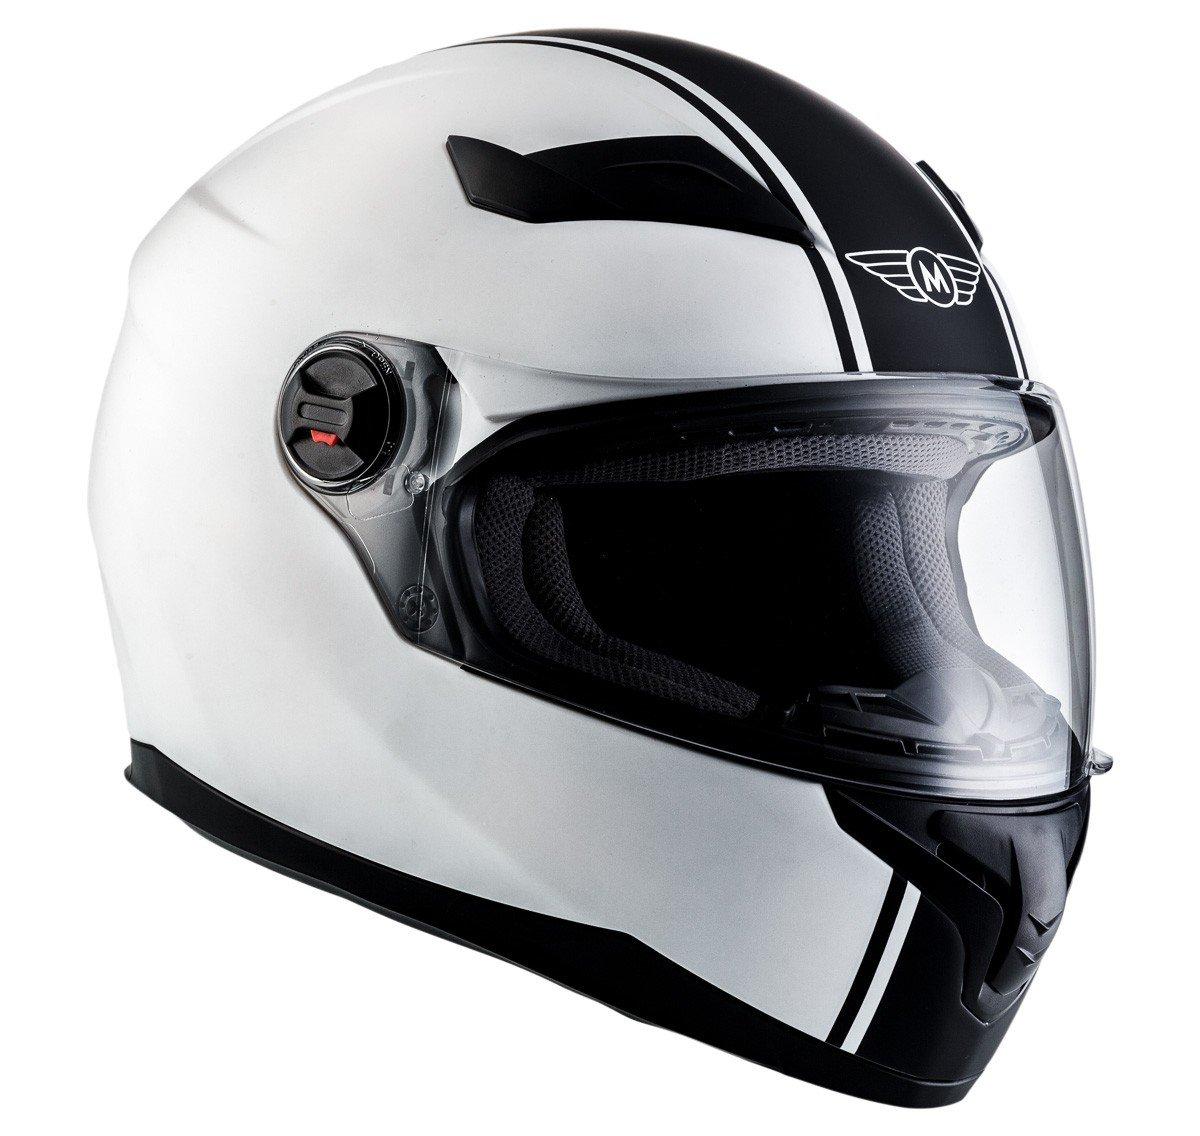 MOTO X86 Gloss Black /· Cruiser Casco Integrale Urban Urbano Moto motocicleta Fullface-Helmet Scooter Sport /· ECE certificado /· visera incluido /· incluyendo bolsa de casco /· Negro /· S 55-56cm